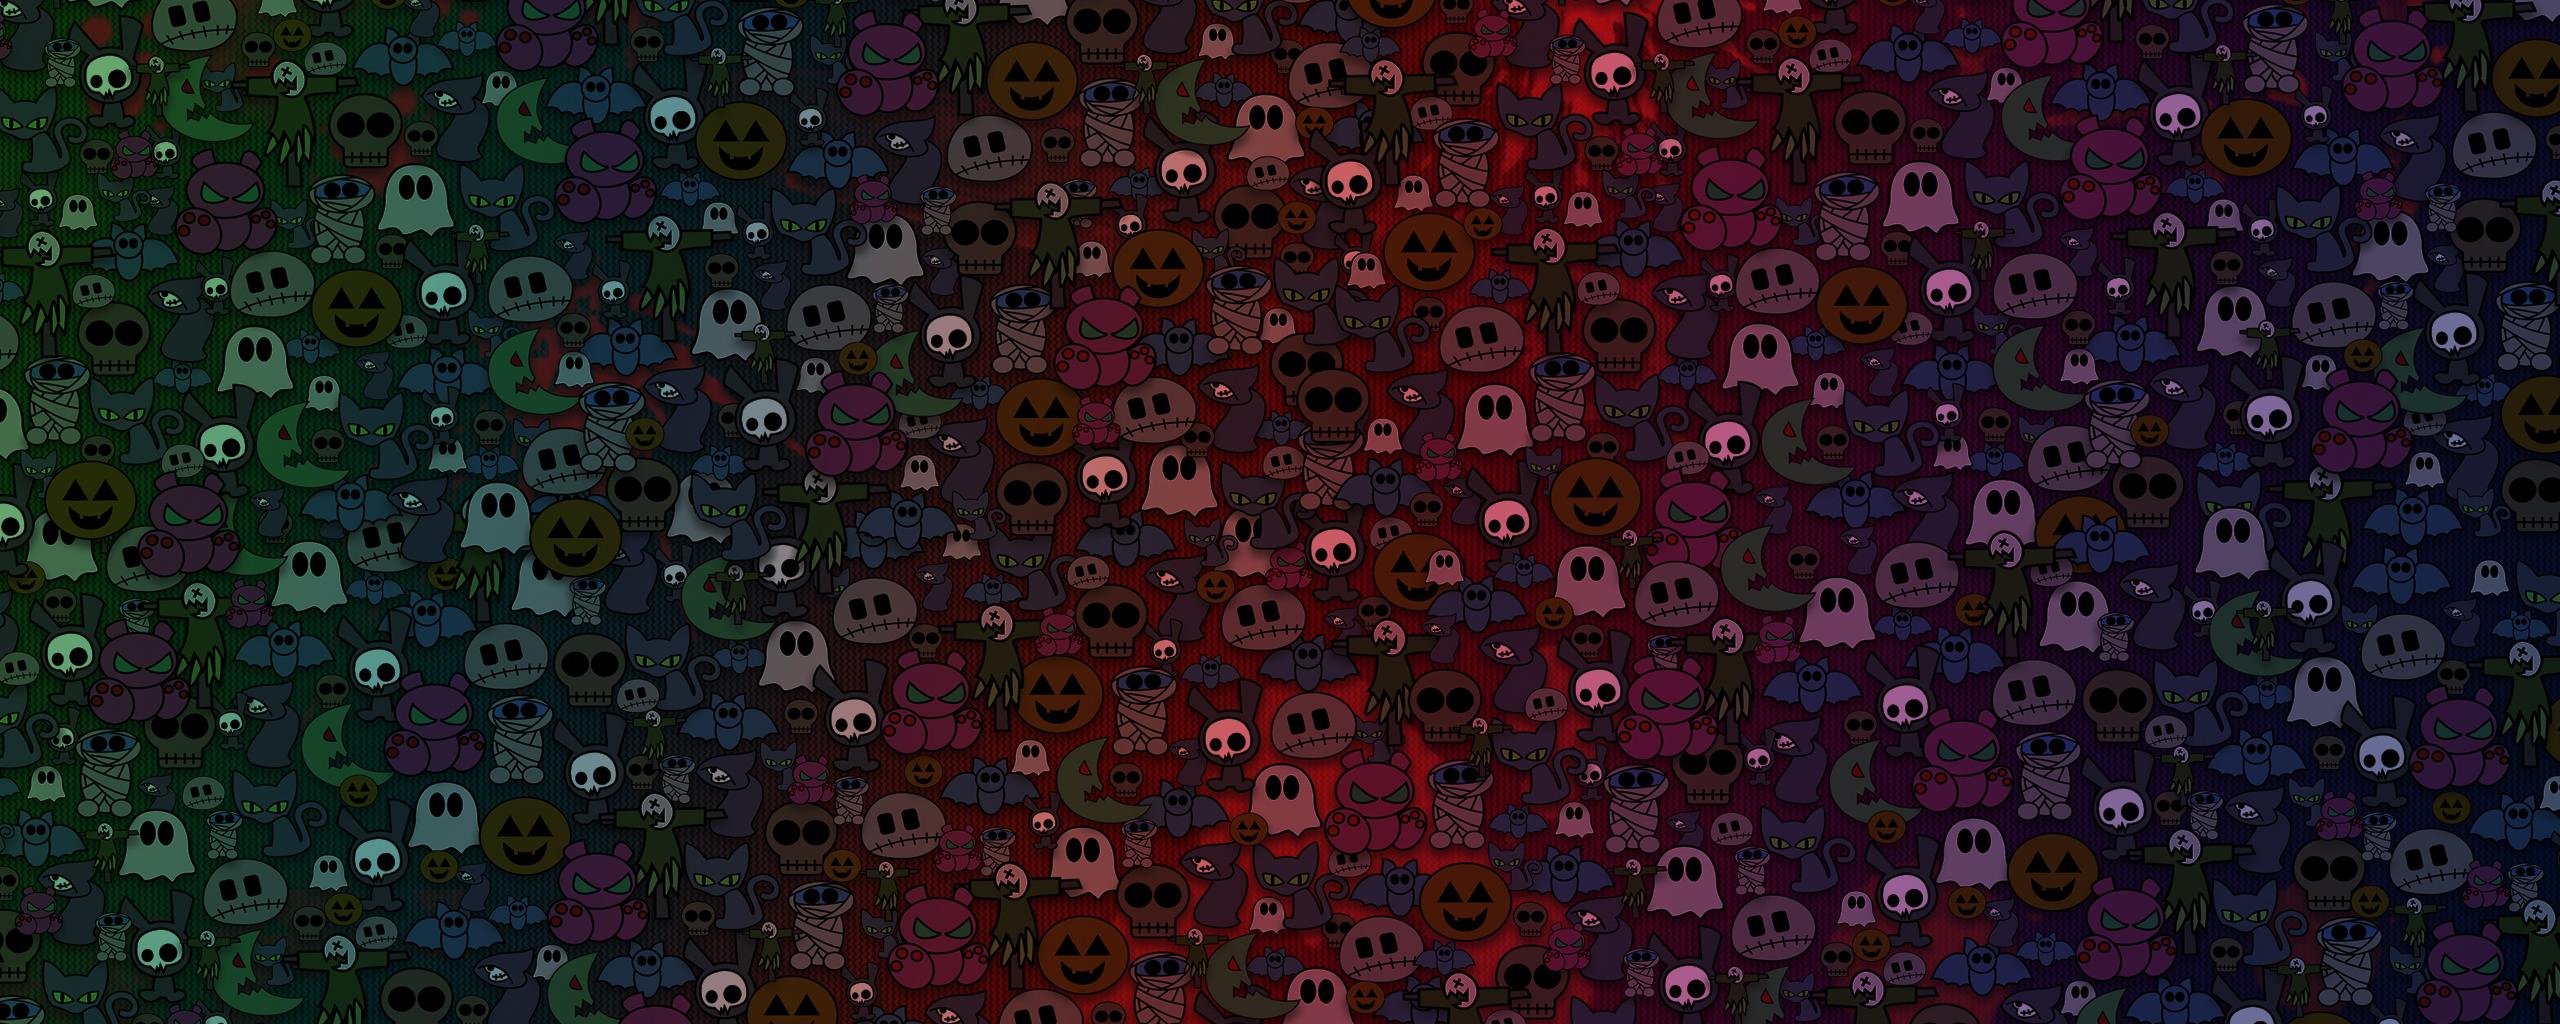 scary-ghosts-abstract-ya.jpg